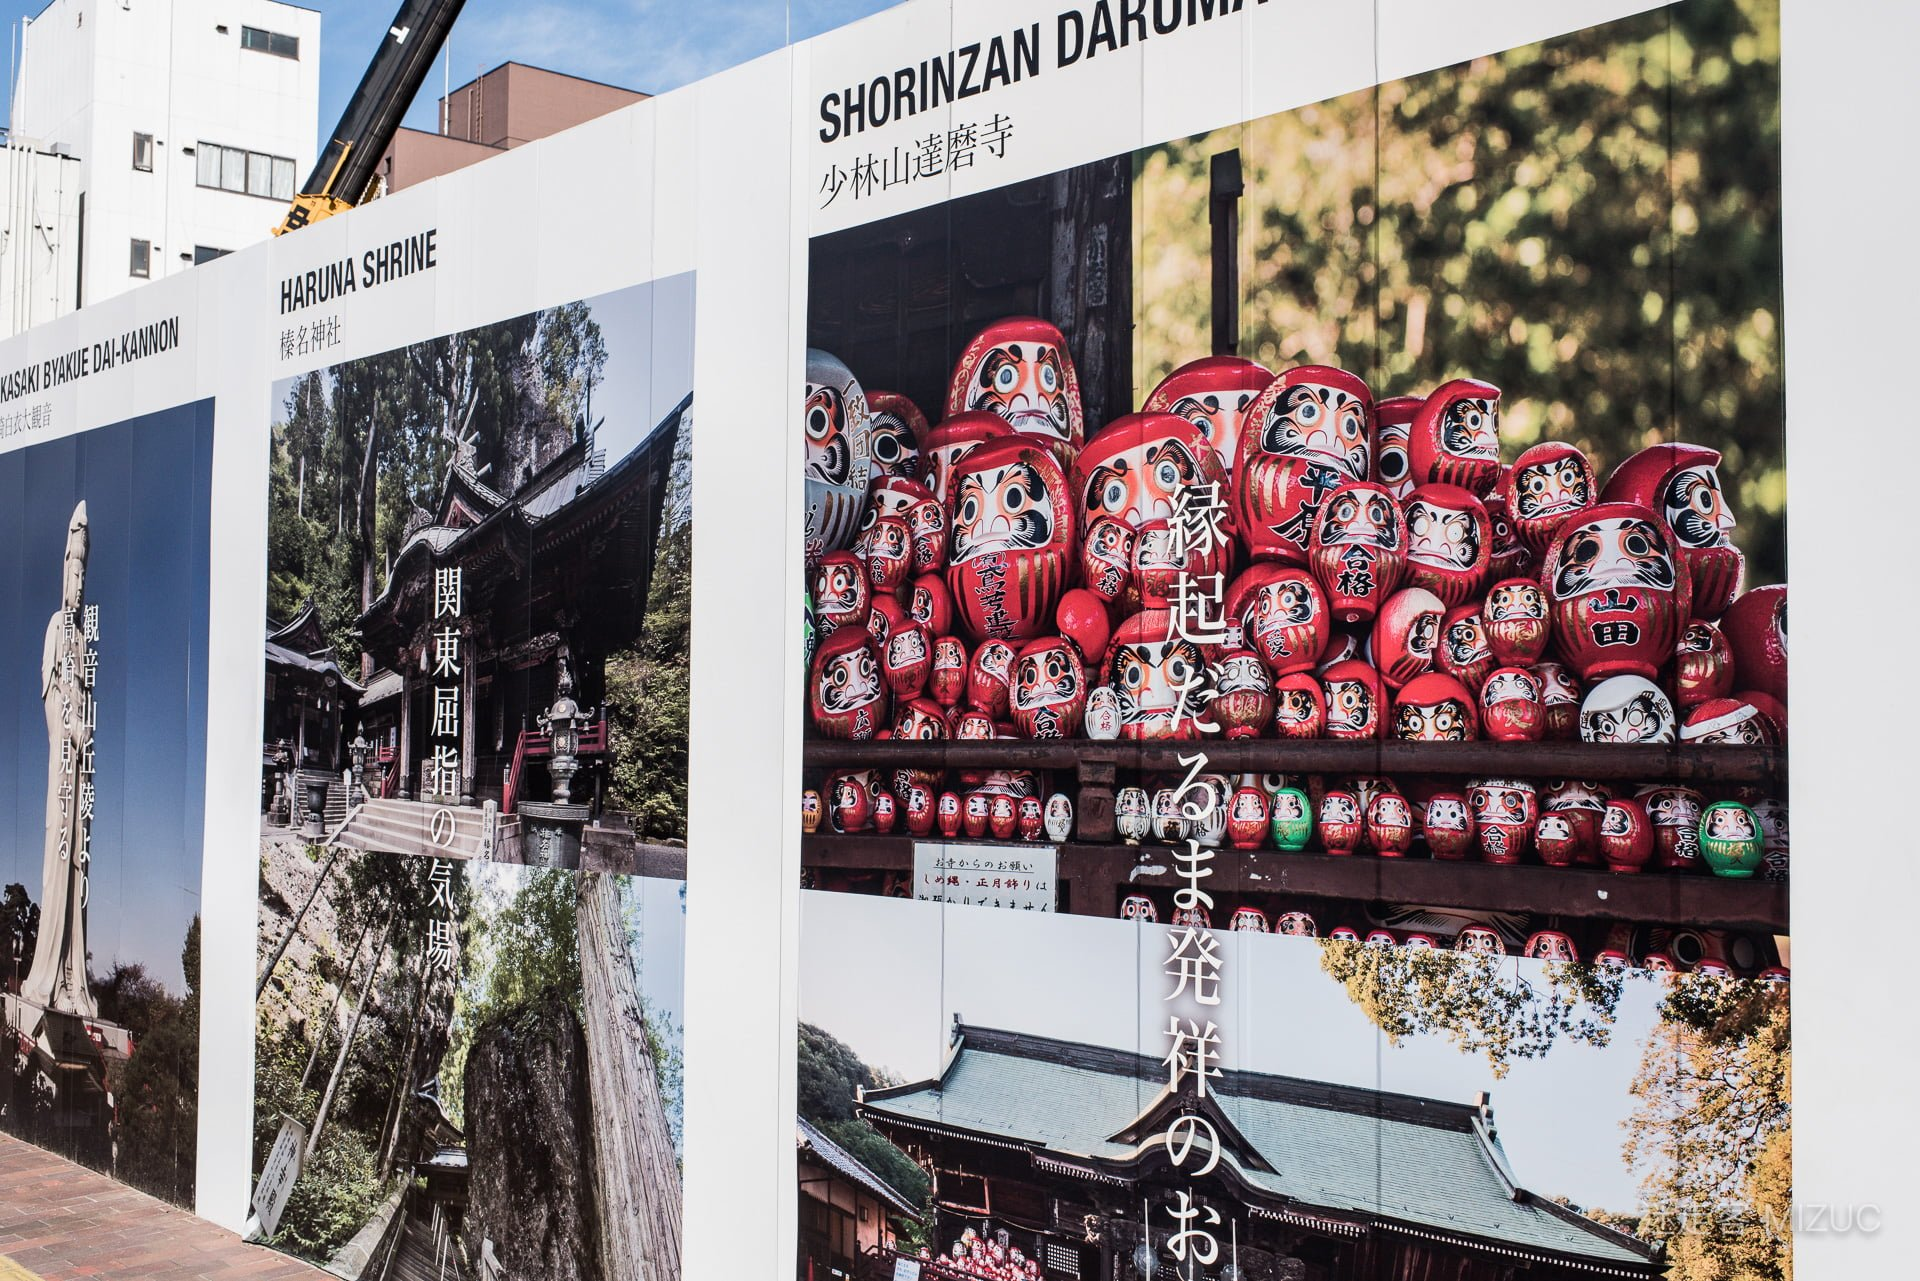 201711 Ibaraki Tochigi Gunma Japan Travel By RentalCar 89 日本自駕旅遊/北關東三縣「茨城、櫪木、群馬」秋天美食、溫泉與瀑布秘境百景(精選照片分享)